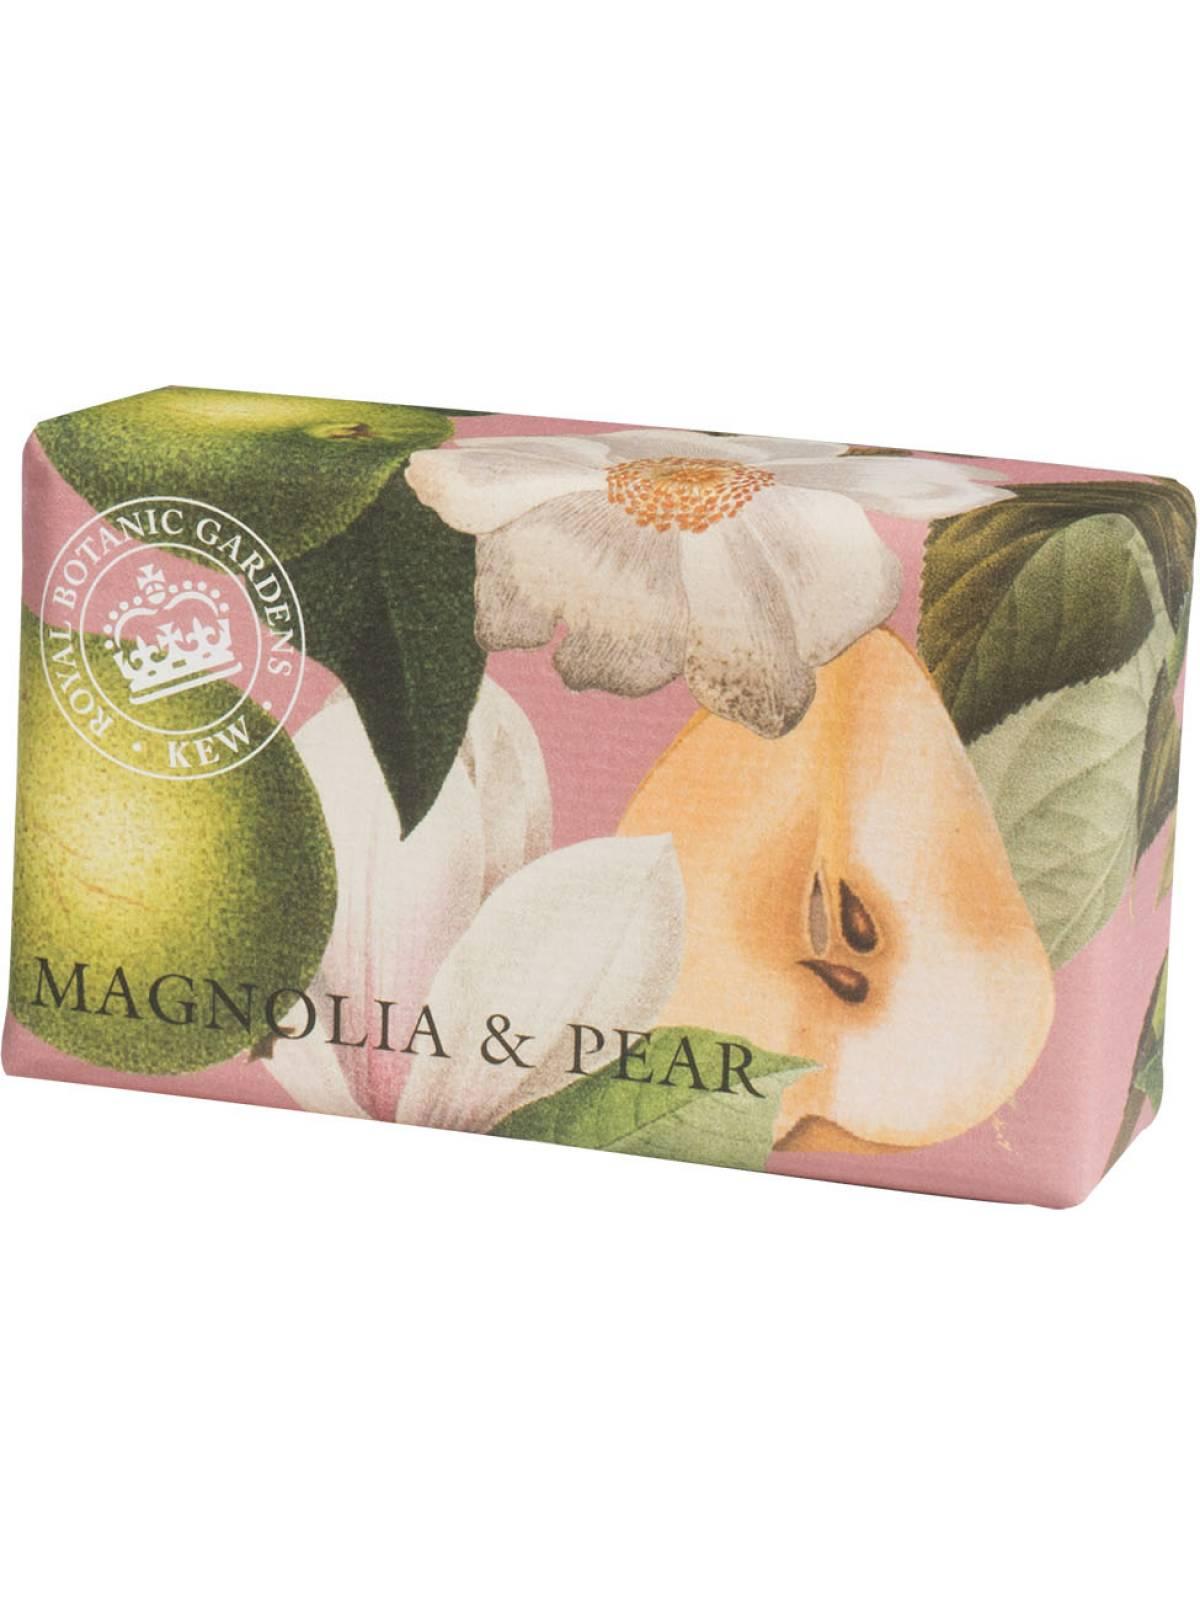 Magnolia & Pear Kew Gardens Soap 240g